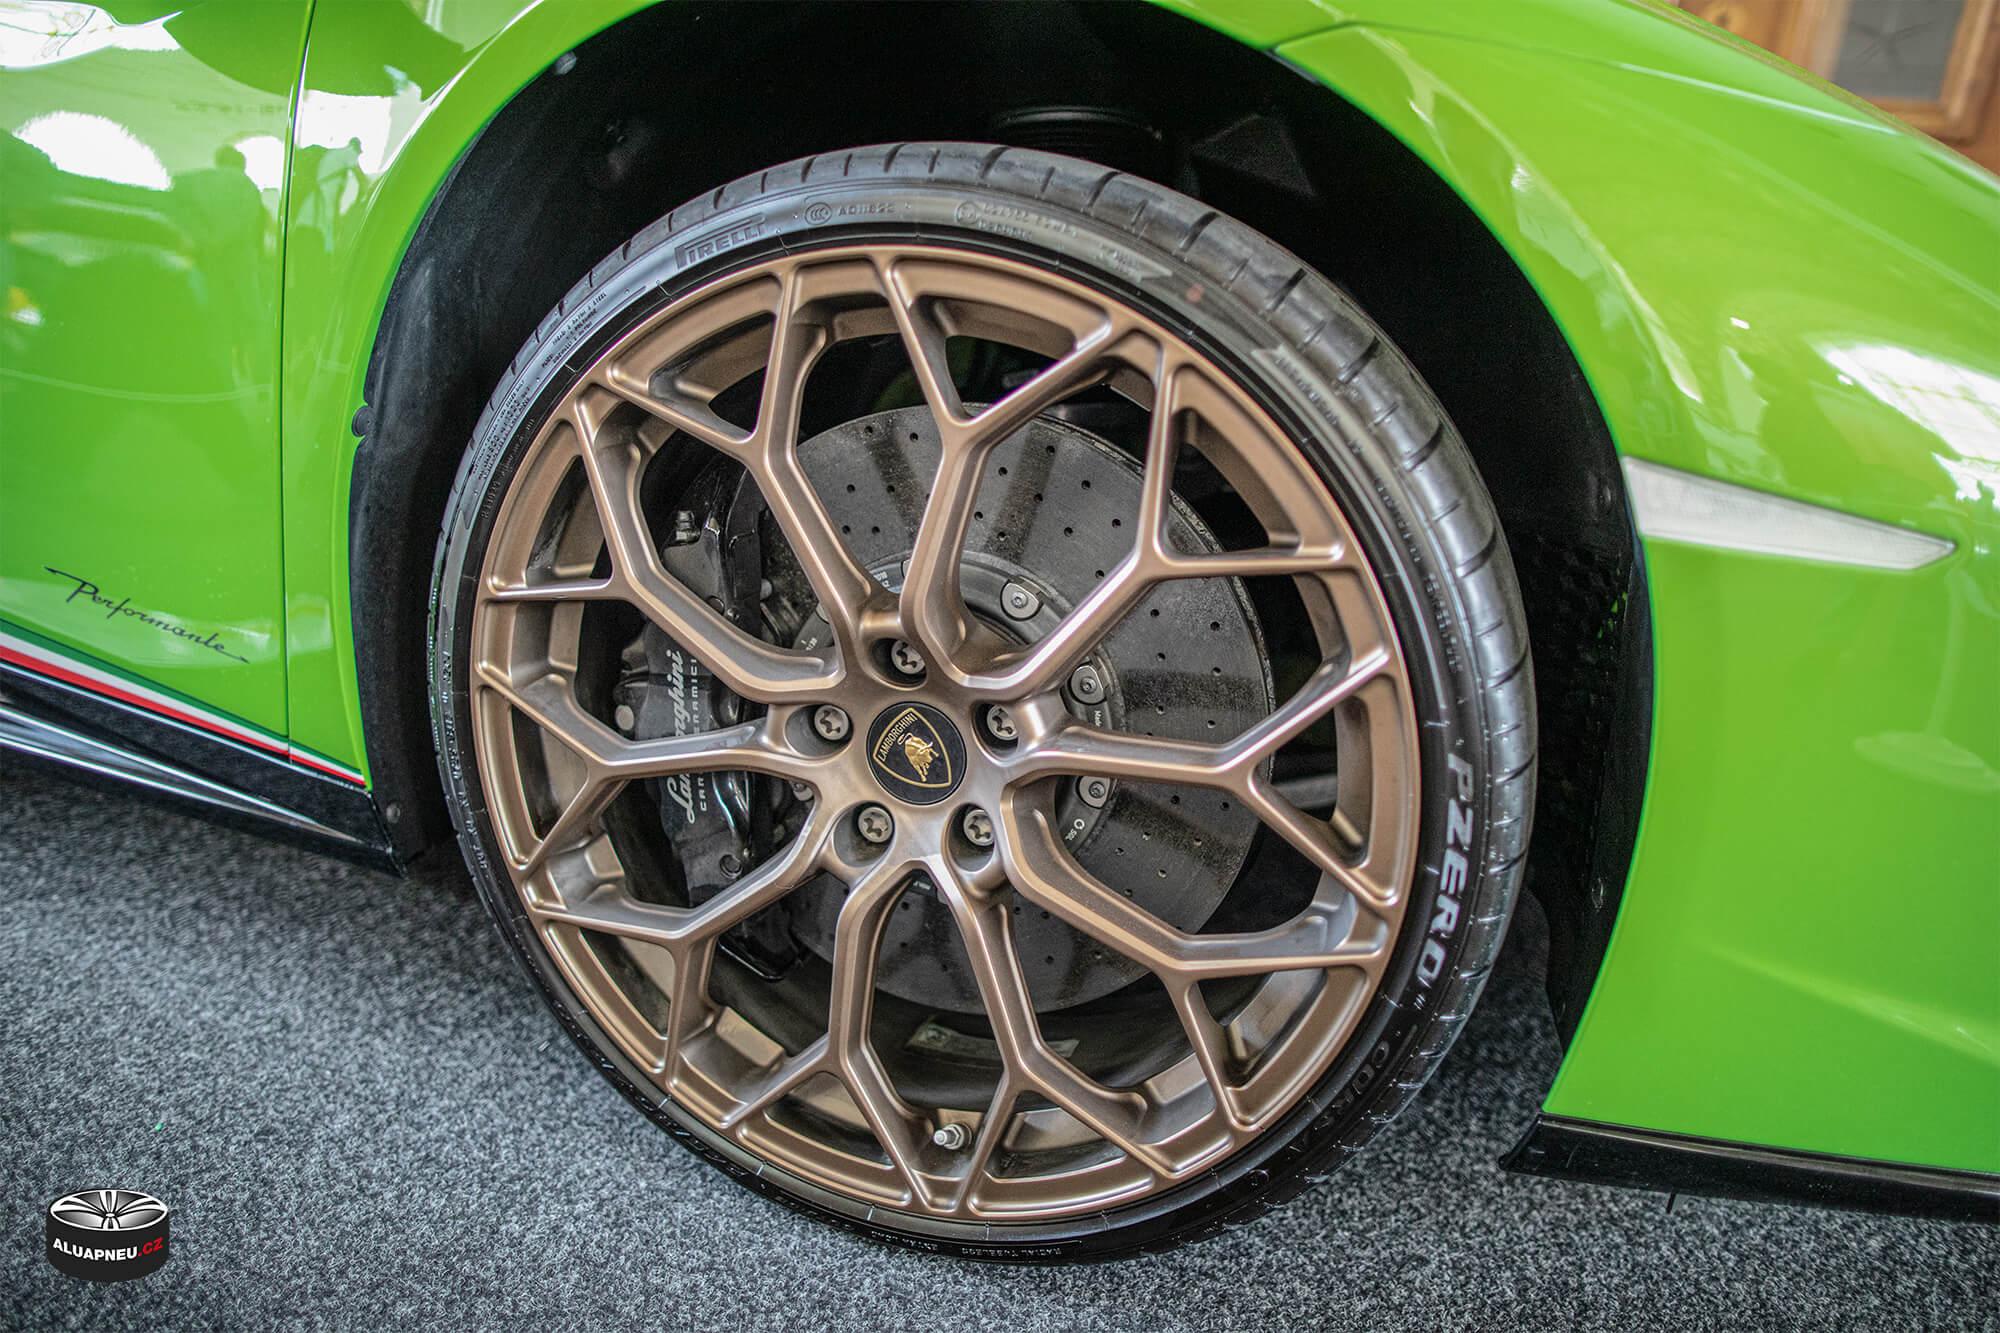 Bronzová alu kola Lamborghini - Automobilové Legendy 2019 - www.aluapneu.cz